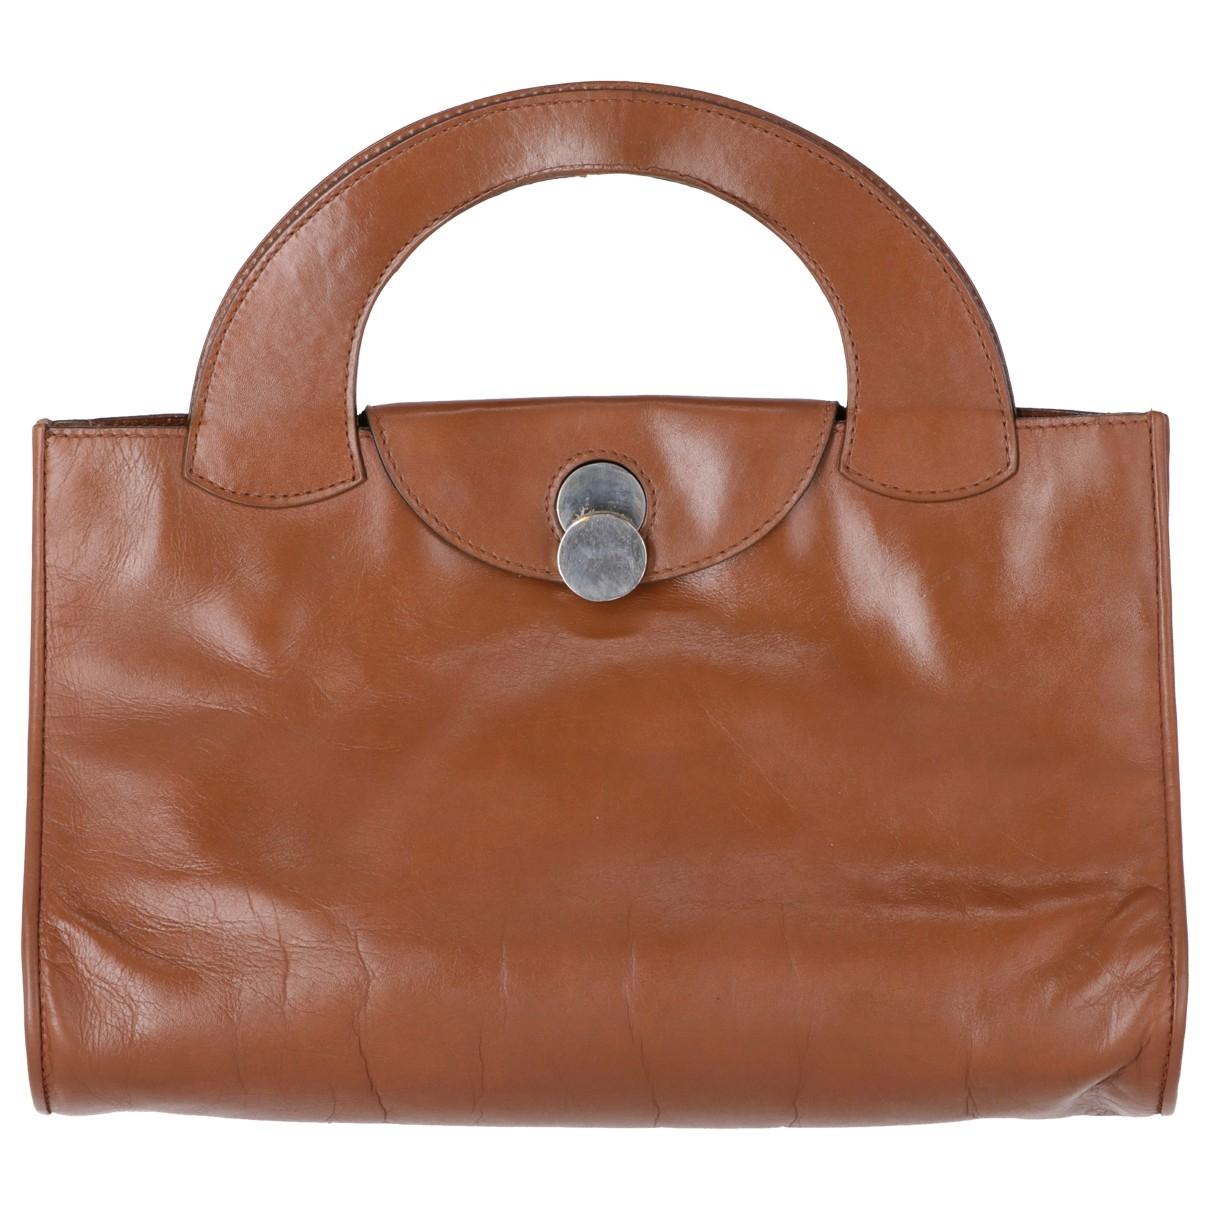 Gherardini \N Brown Leather handbag for Women \N